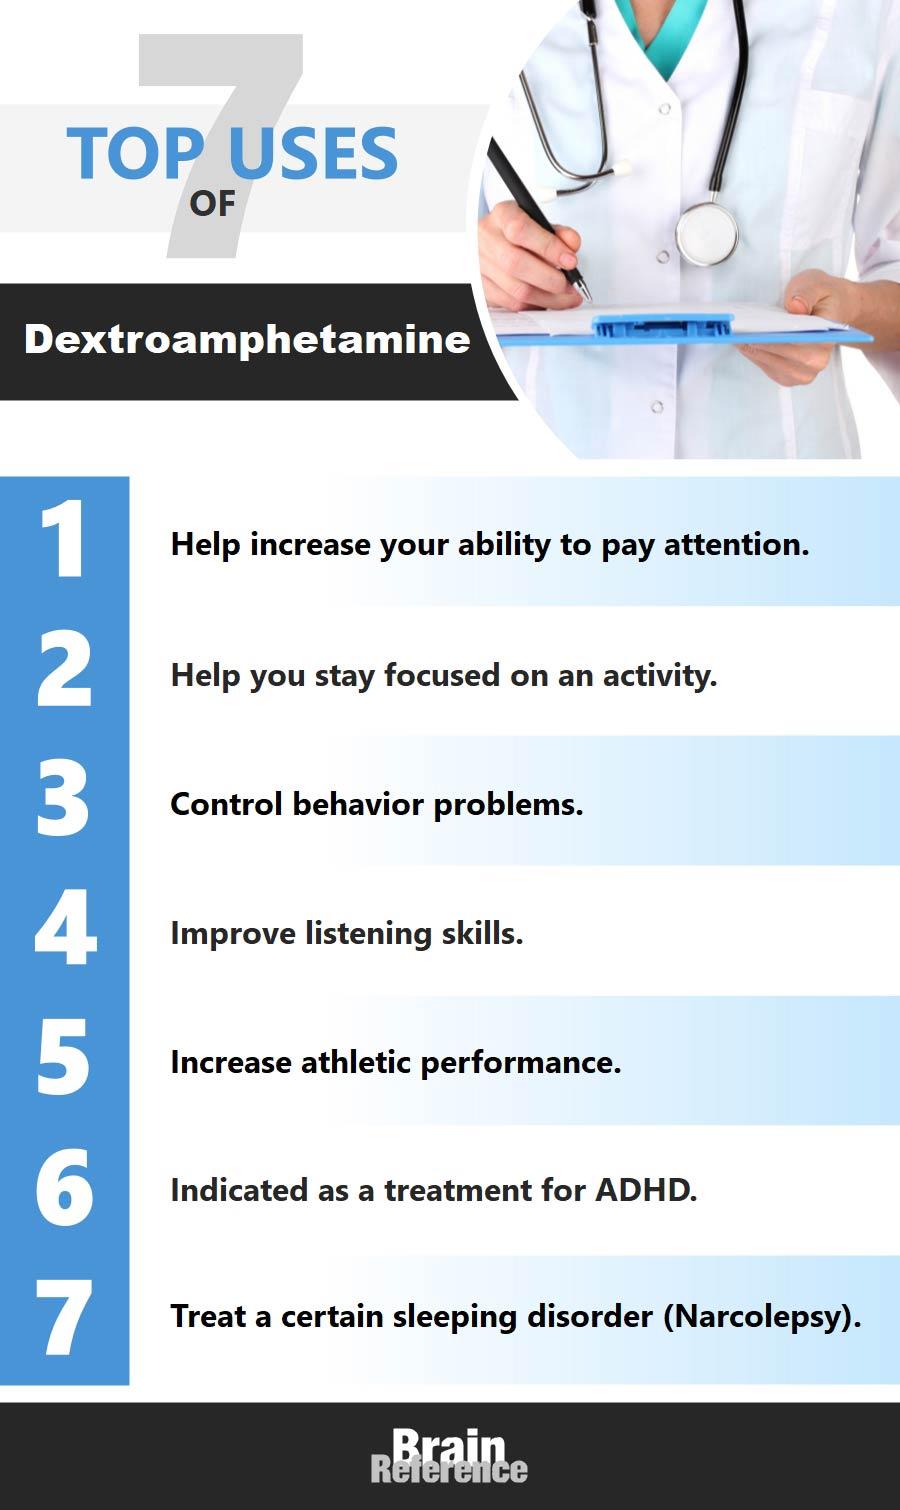 Dexedrine-Dextroamphetamine-Amneal-Pharmaceuticals-Top-Uses